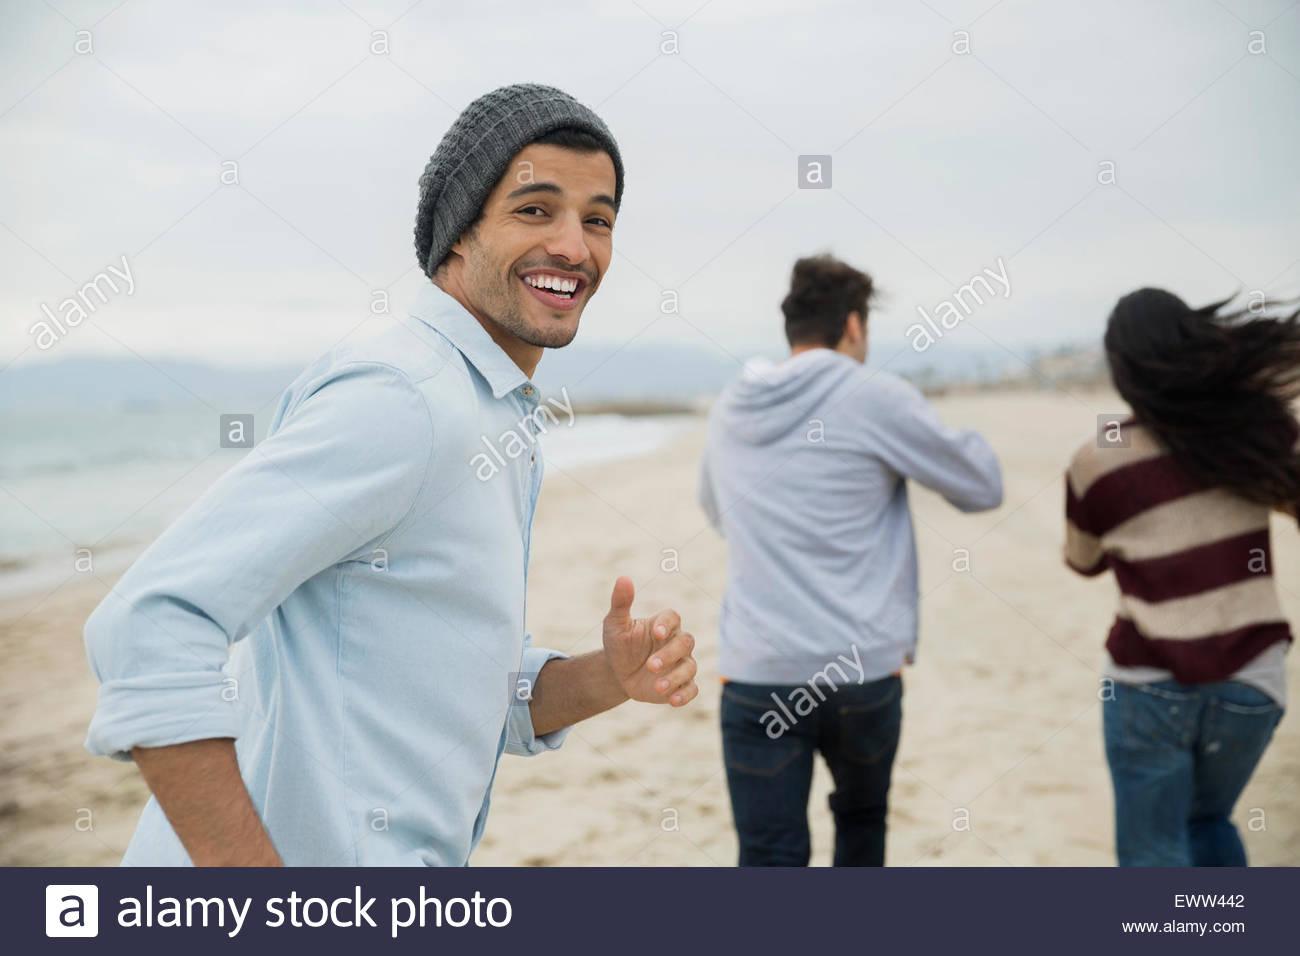 Portrait smiling man running avec des amis on beach Photo Stock